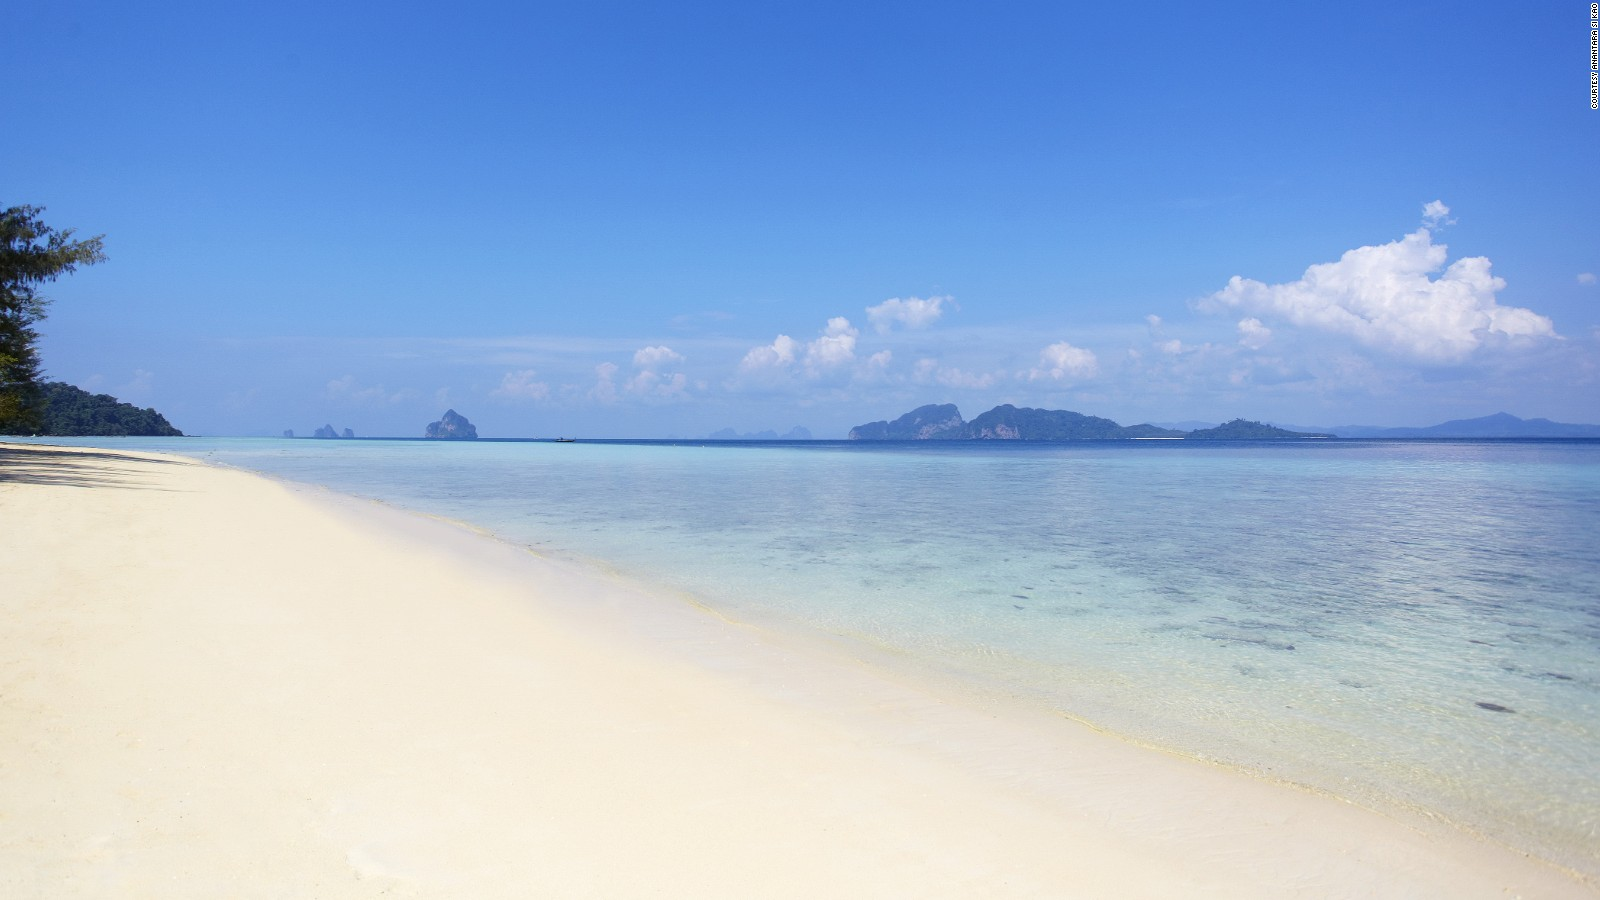 150717162609-islands-of-trang-koh-kradan-full-169.jpg